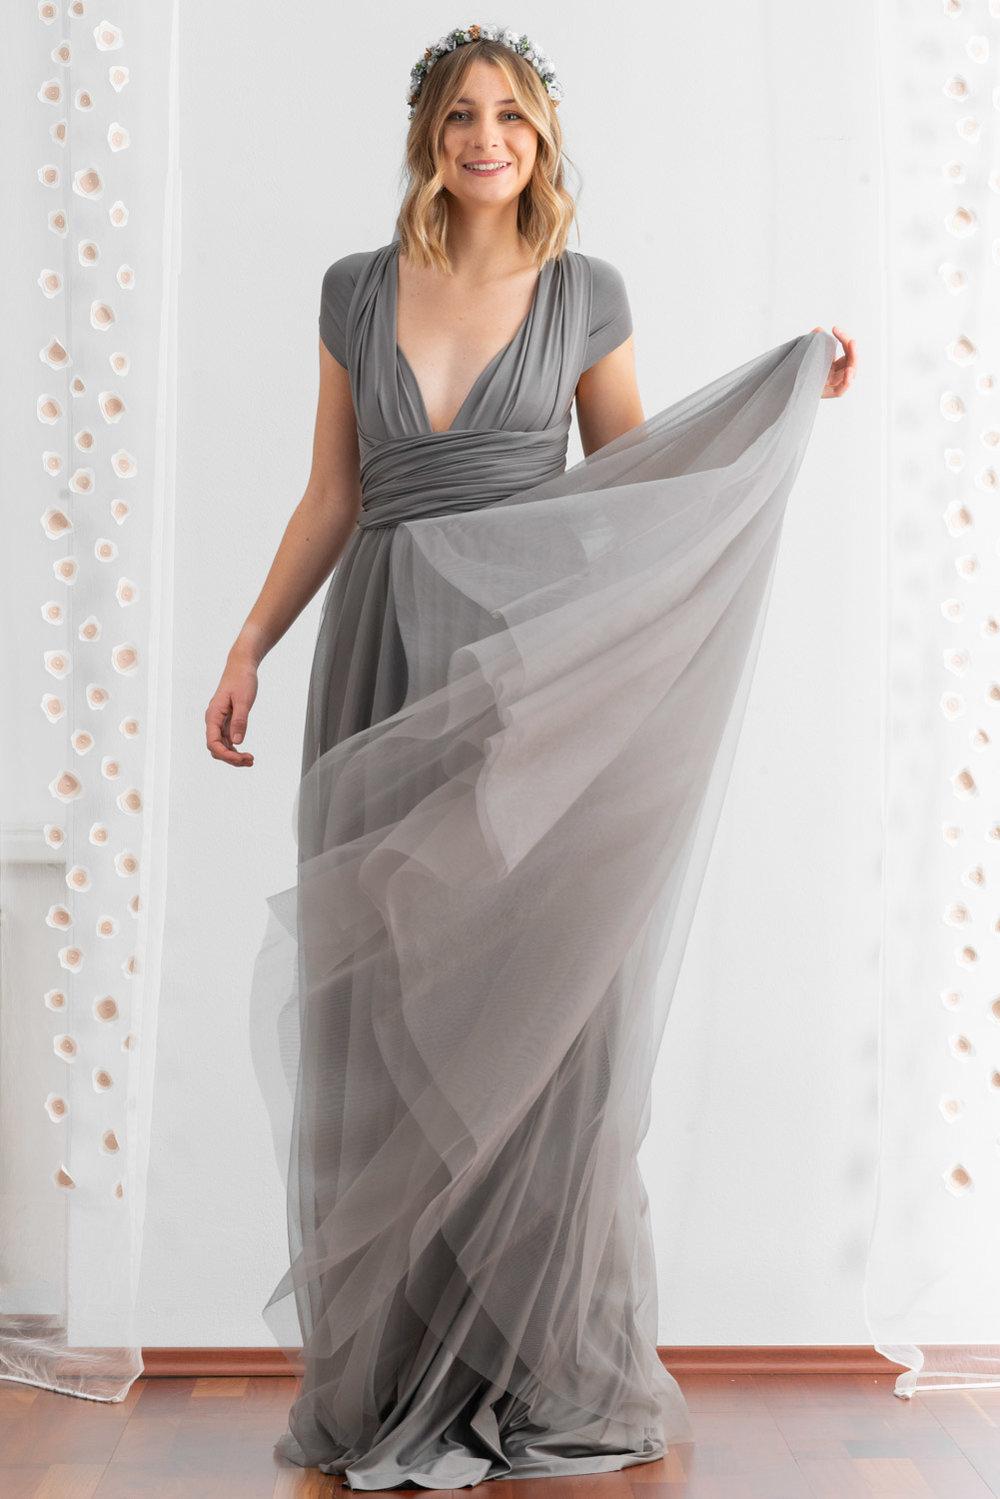 Dress To Wear To Wedding | Bridesmaids Dress Silver Grey We Are Flowergirls Custom